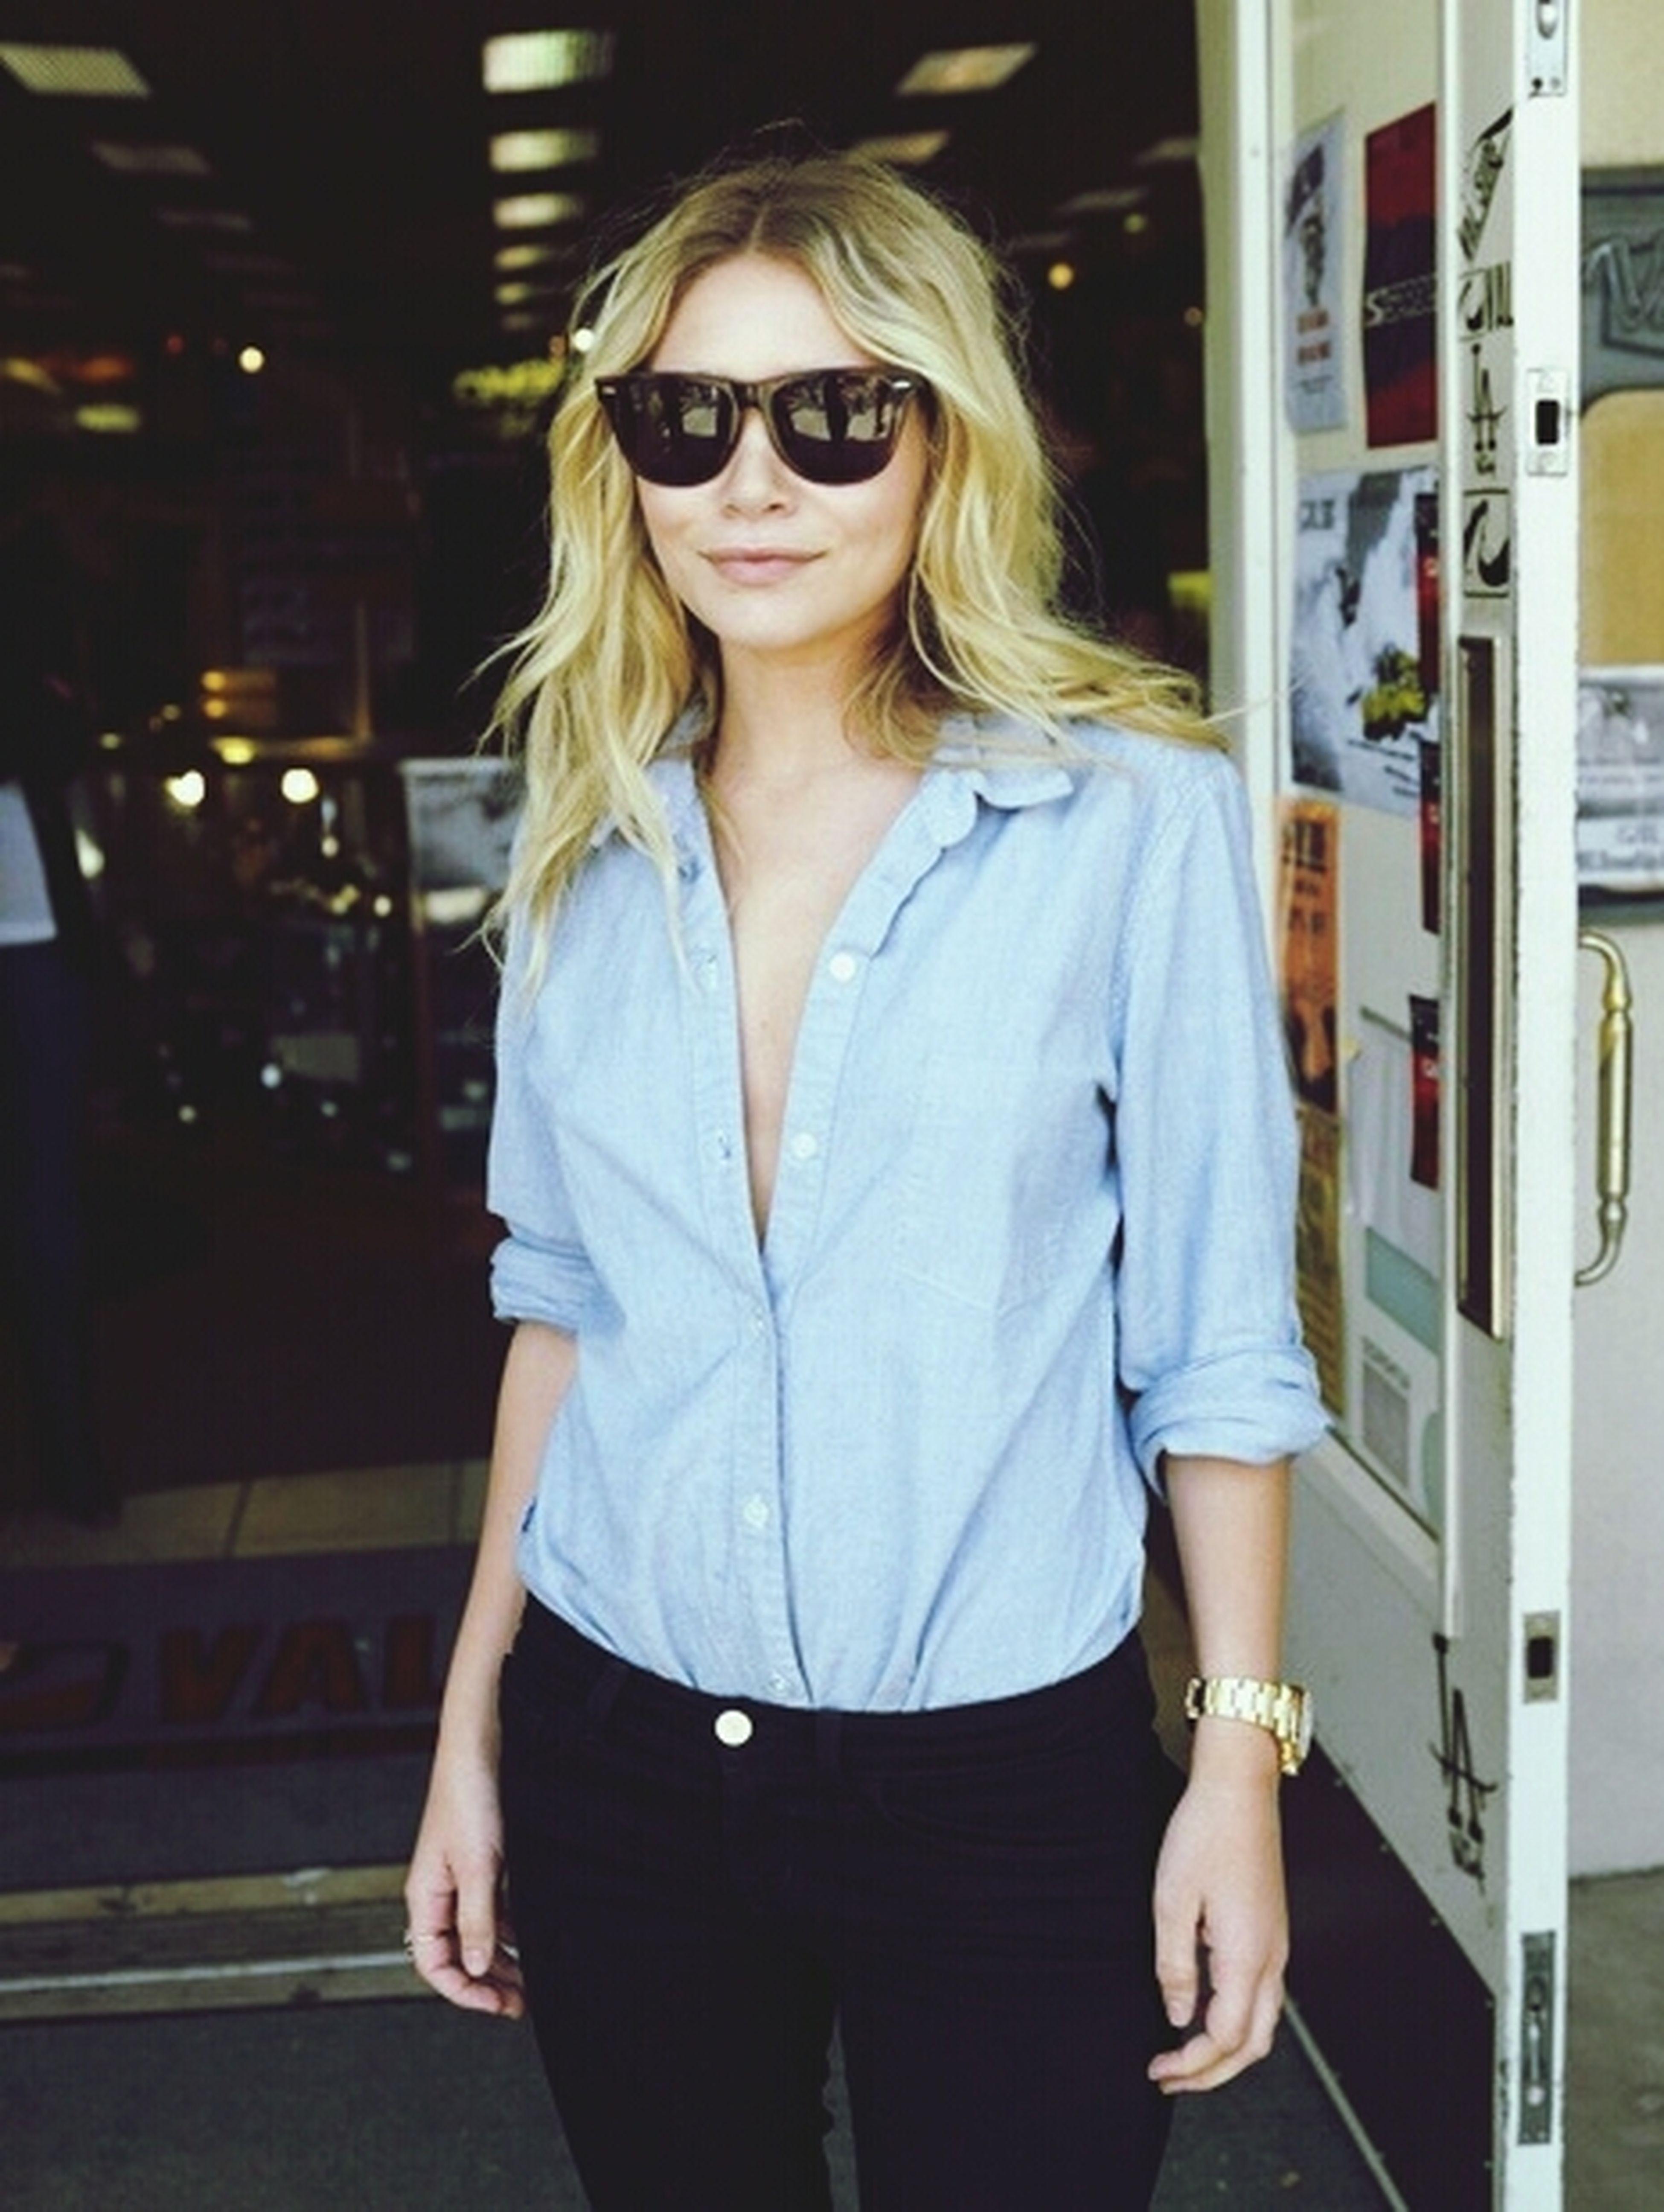 Ashley Olsen Style Fashion I'll Copy That